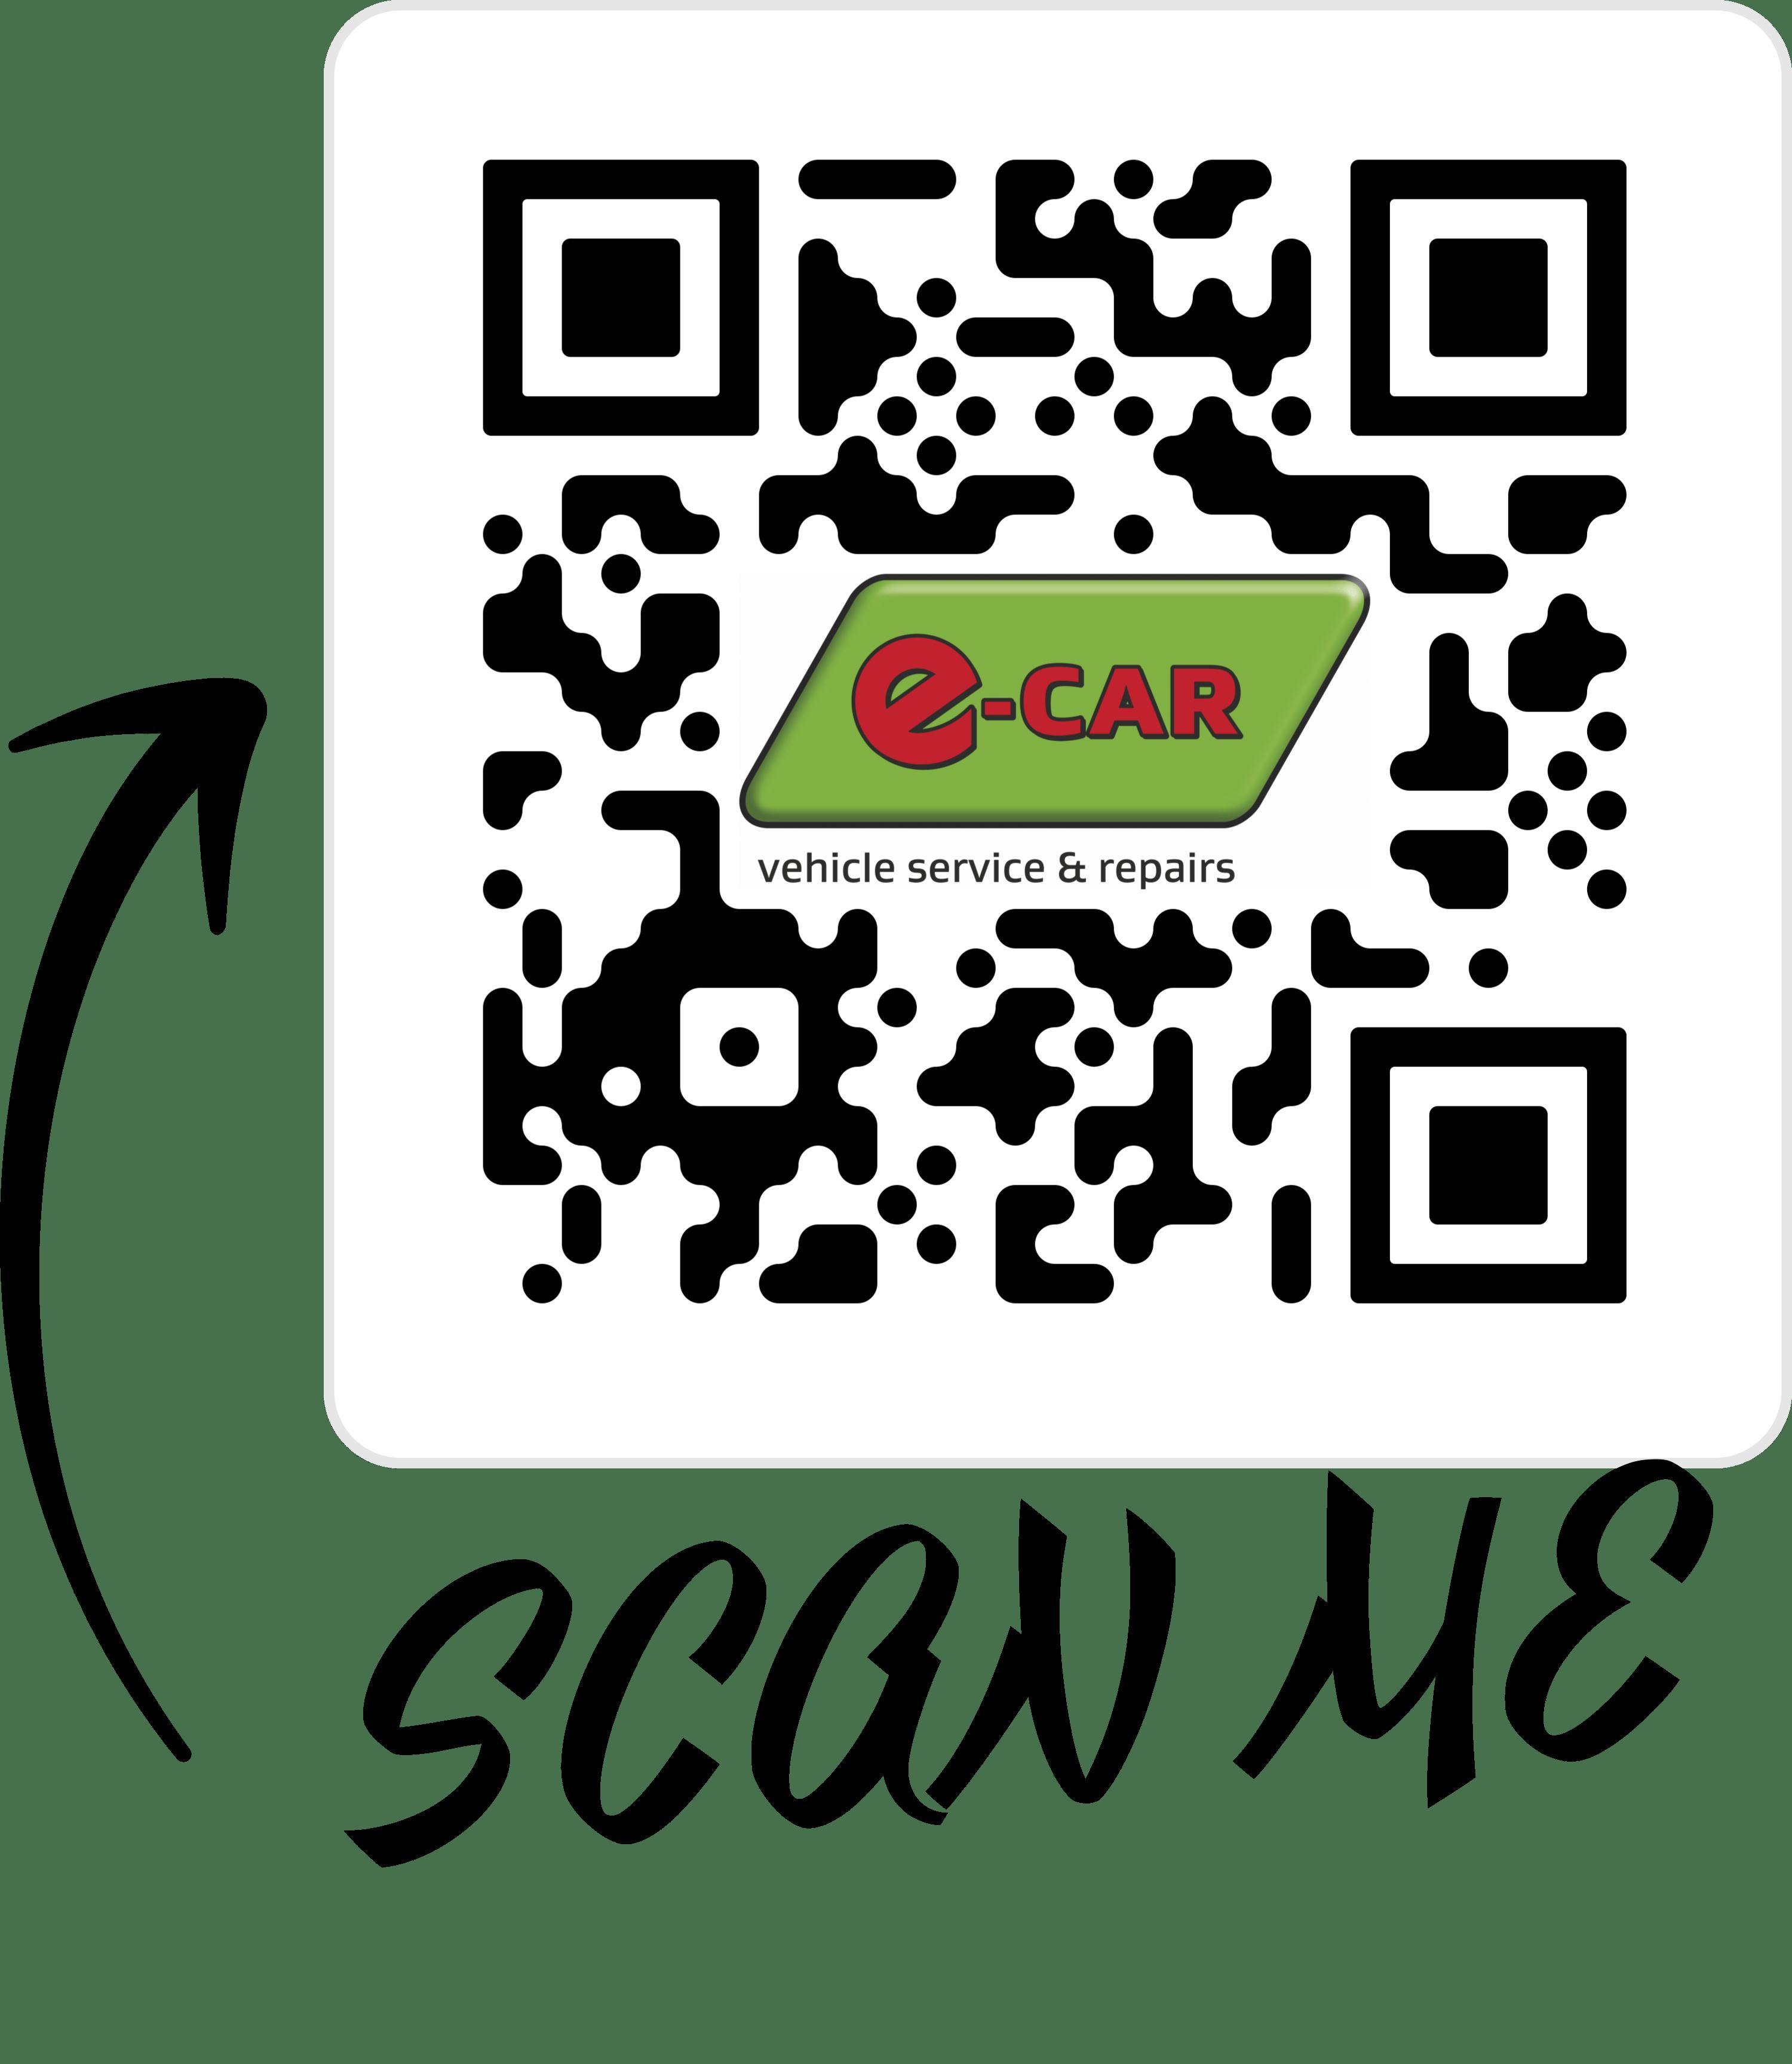 e-car-car-service-rating